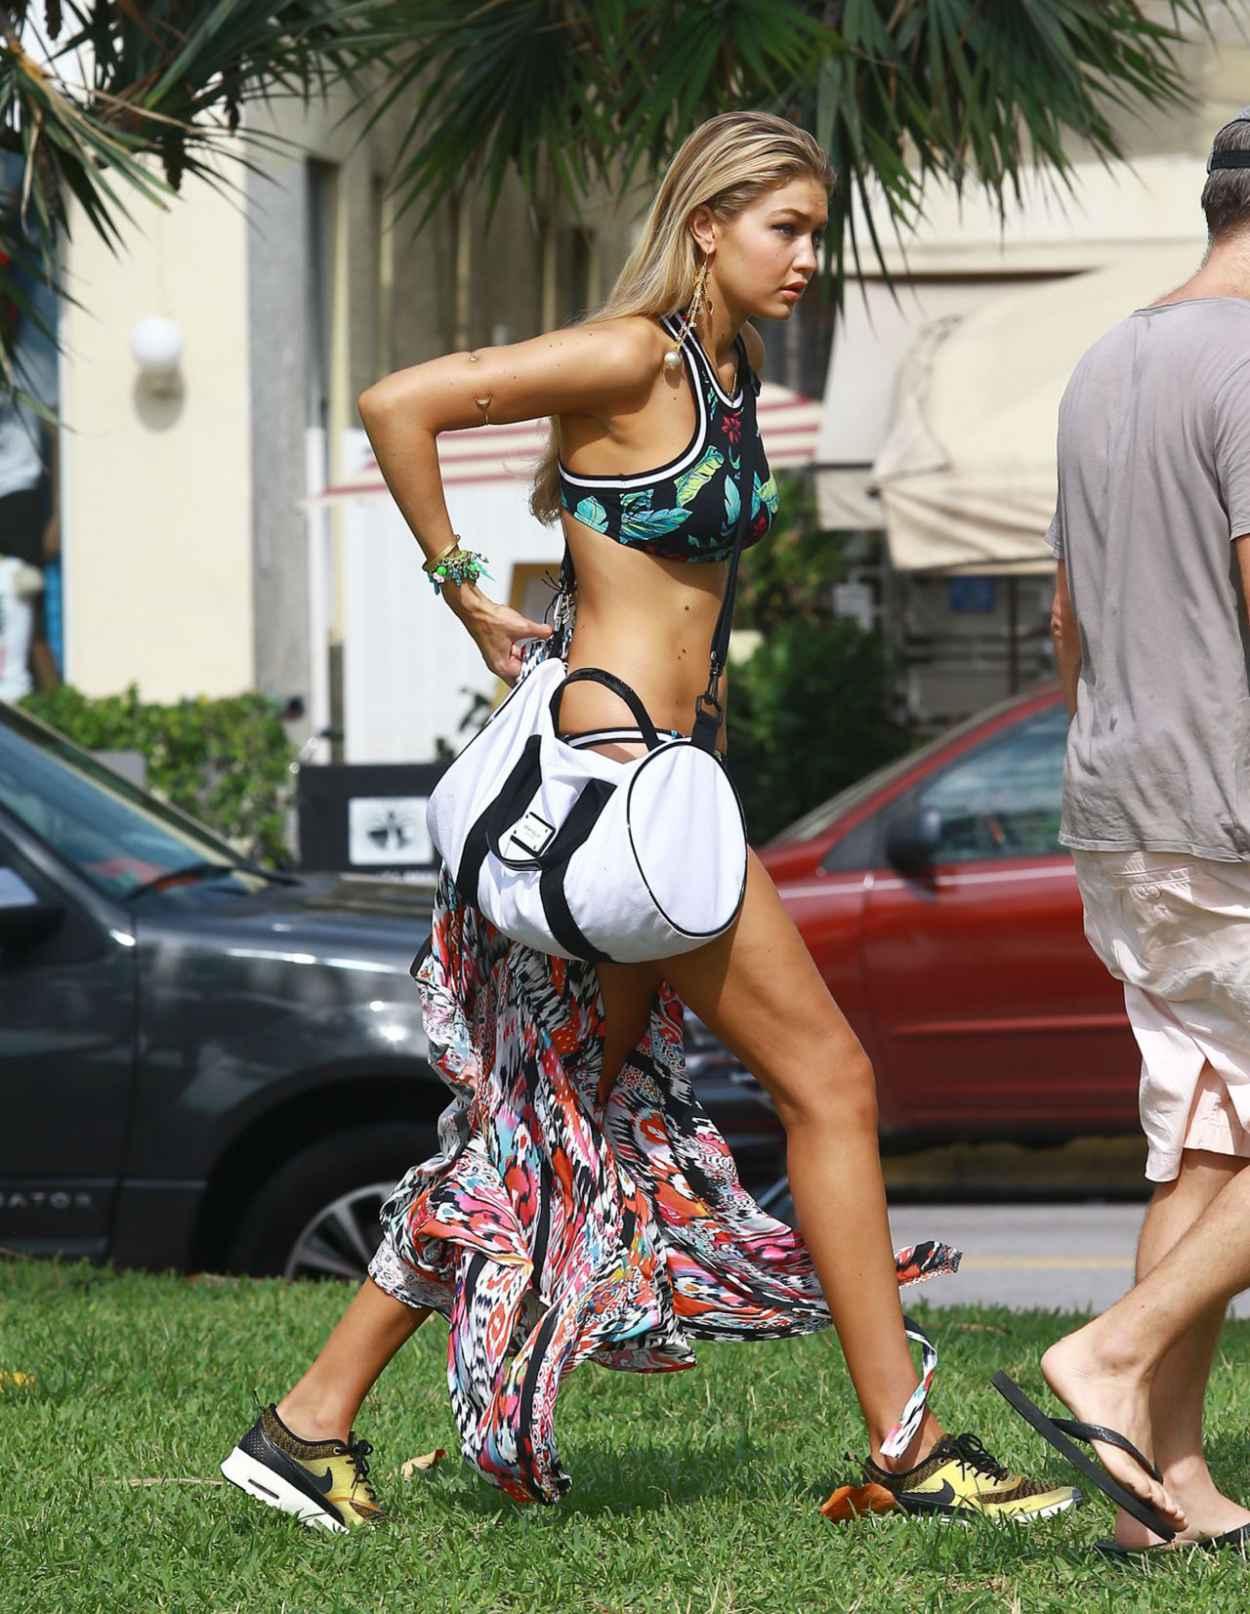 Gigi Hadid - Bikini Photoshoot in Miami, April 2015